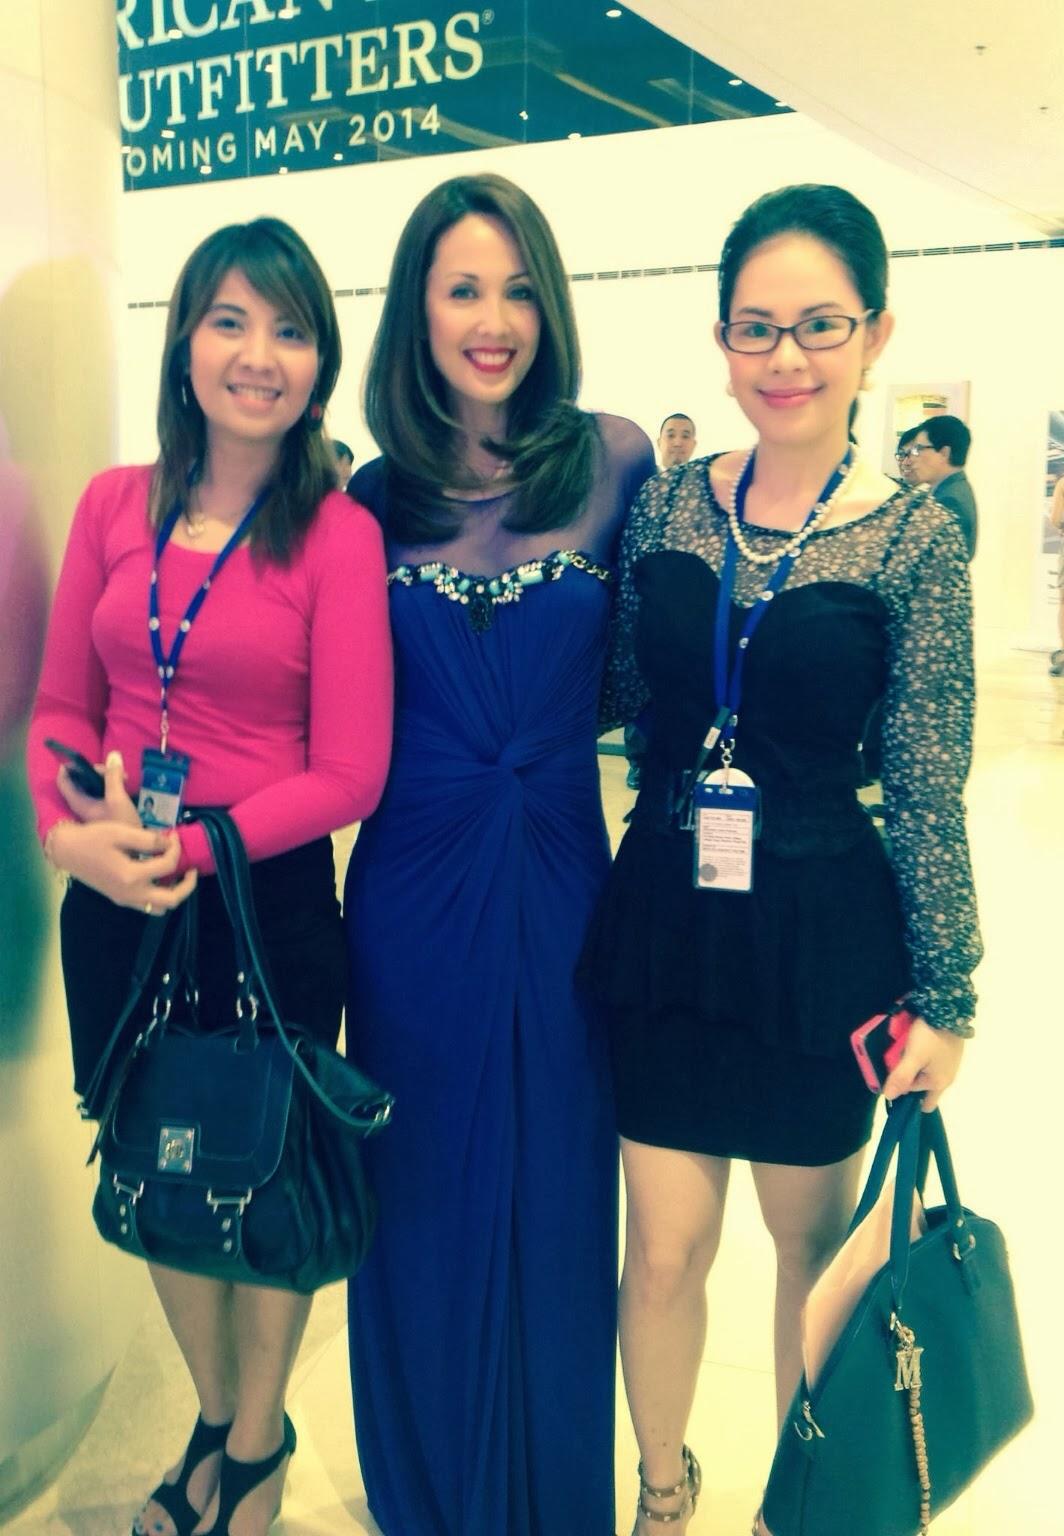 The Mega Fashion Hall Inauguration mary-the-host